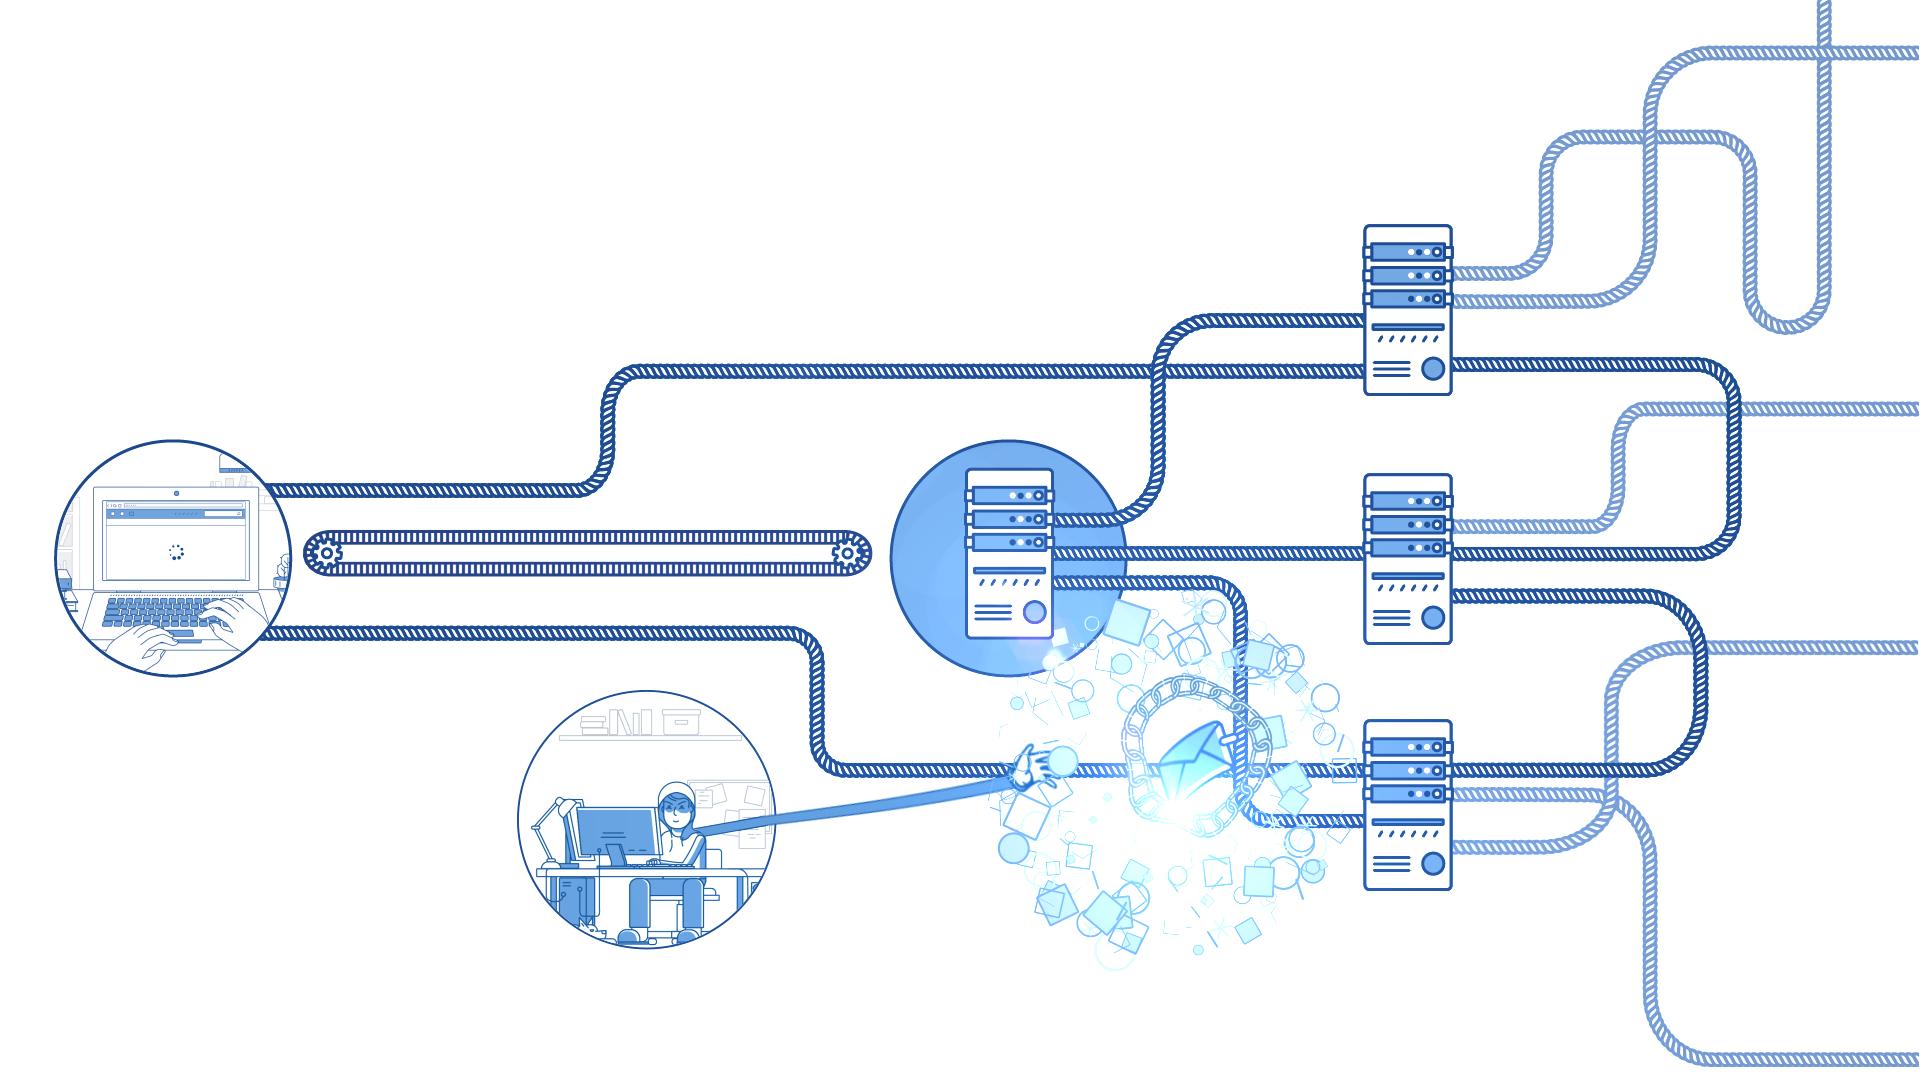 Mist Visual - Studio Animacji. Szósta ilustracja do animacji NASK DNSSEC Video Explainer